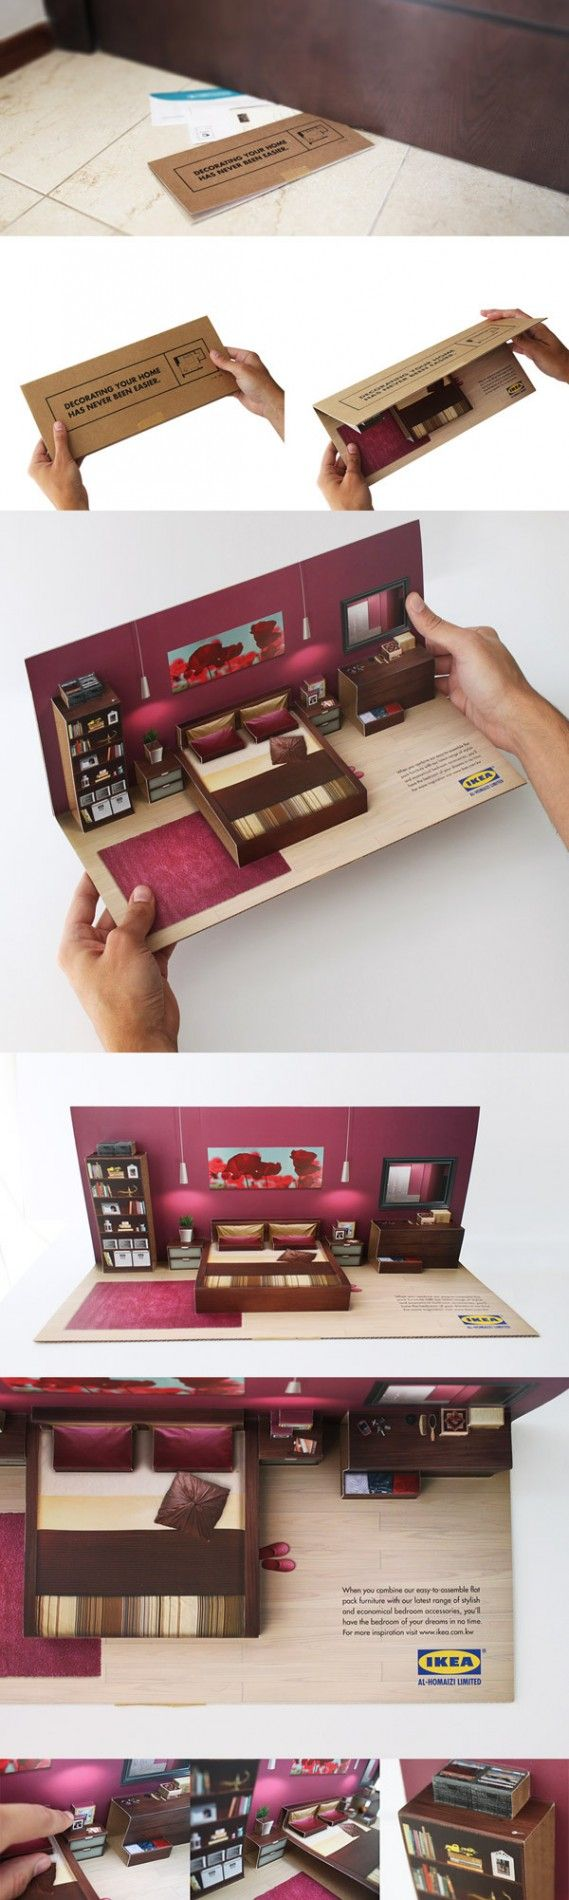 Packaging Design Inspirations 3